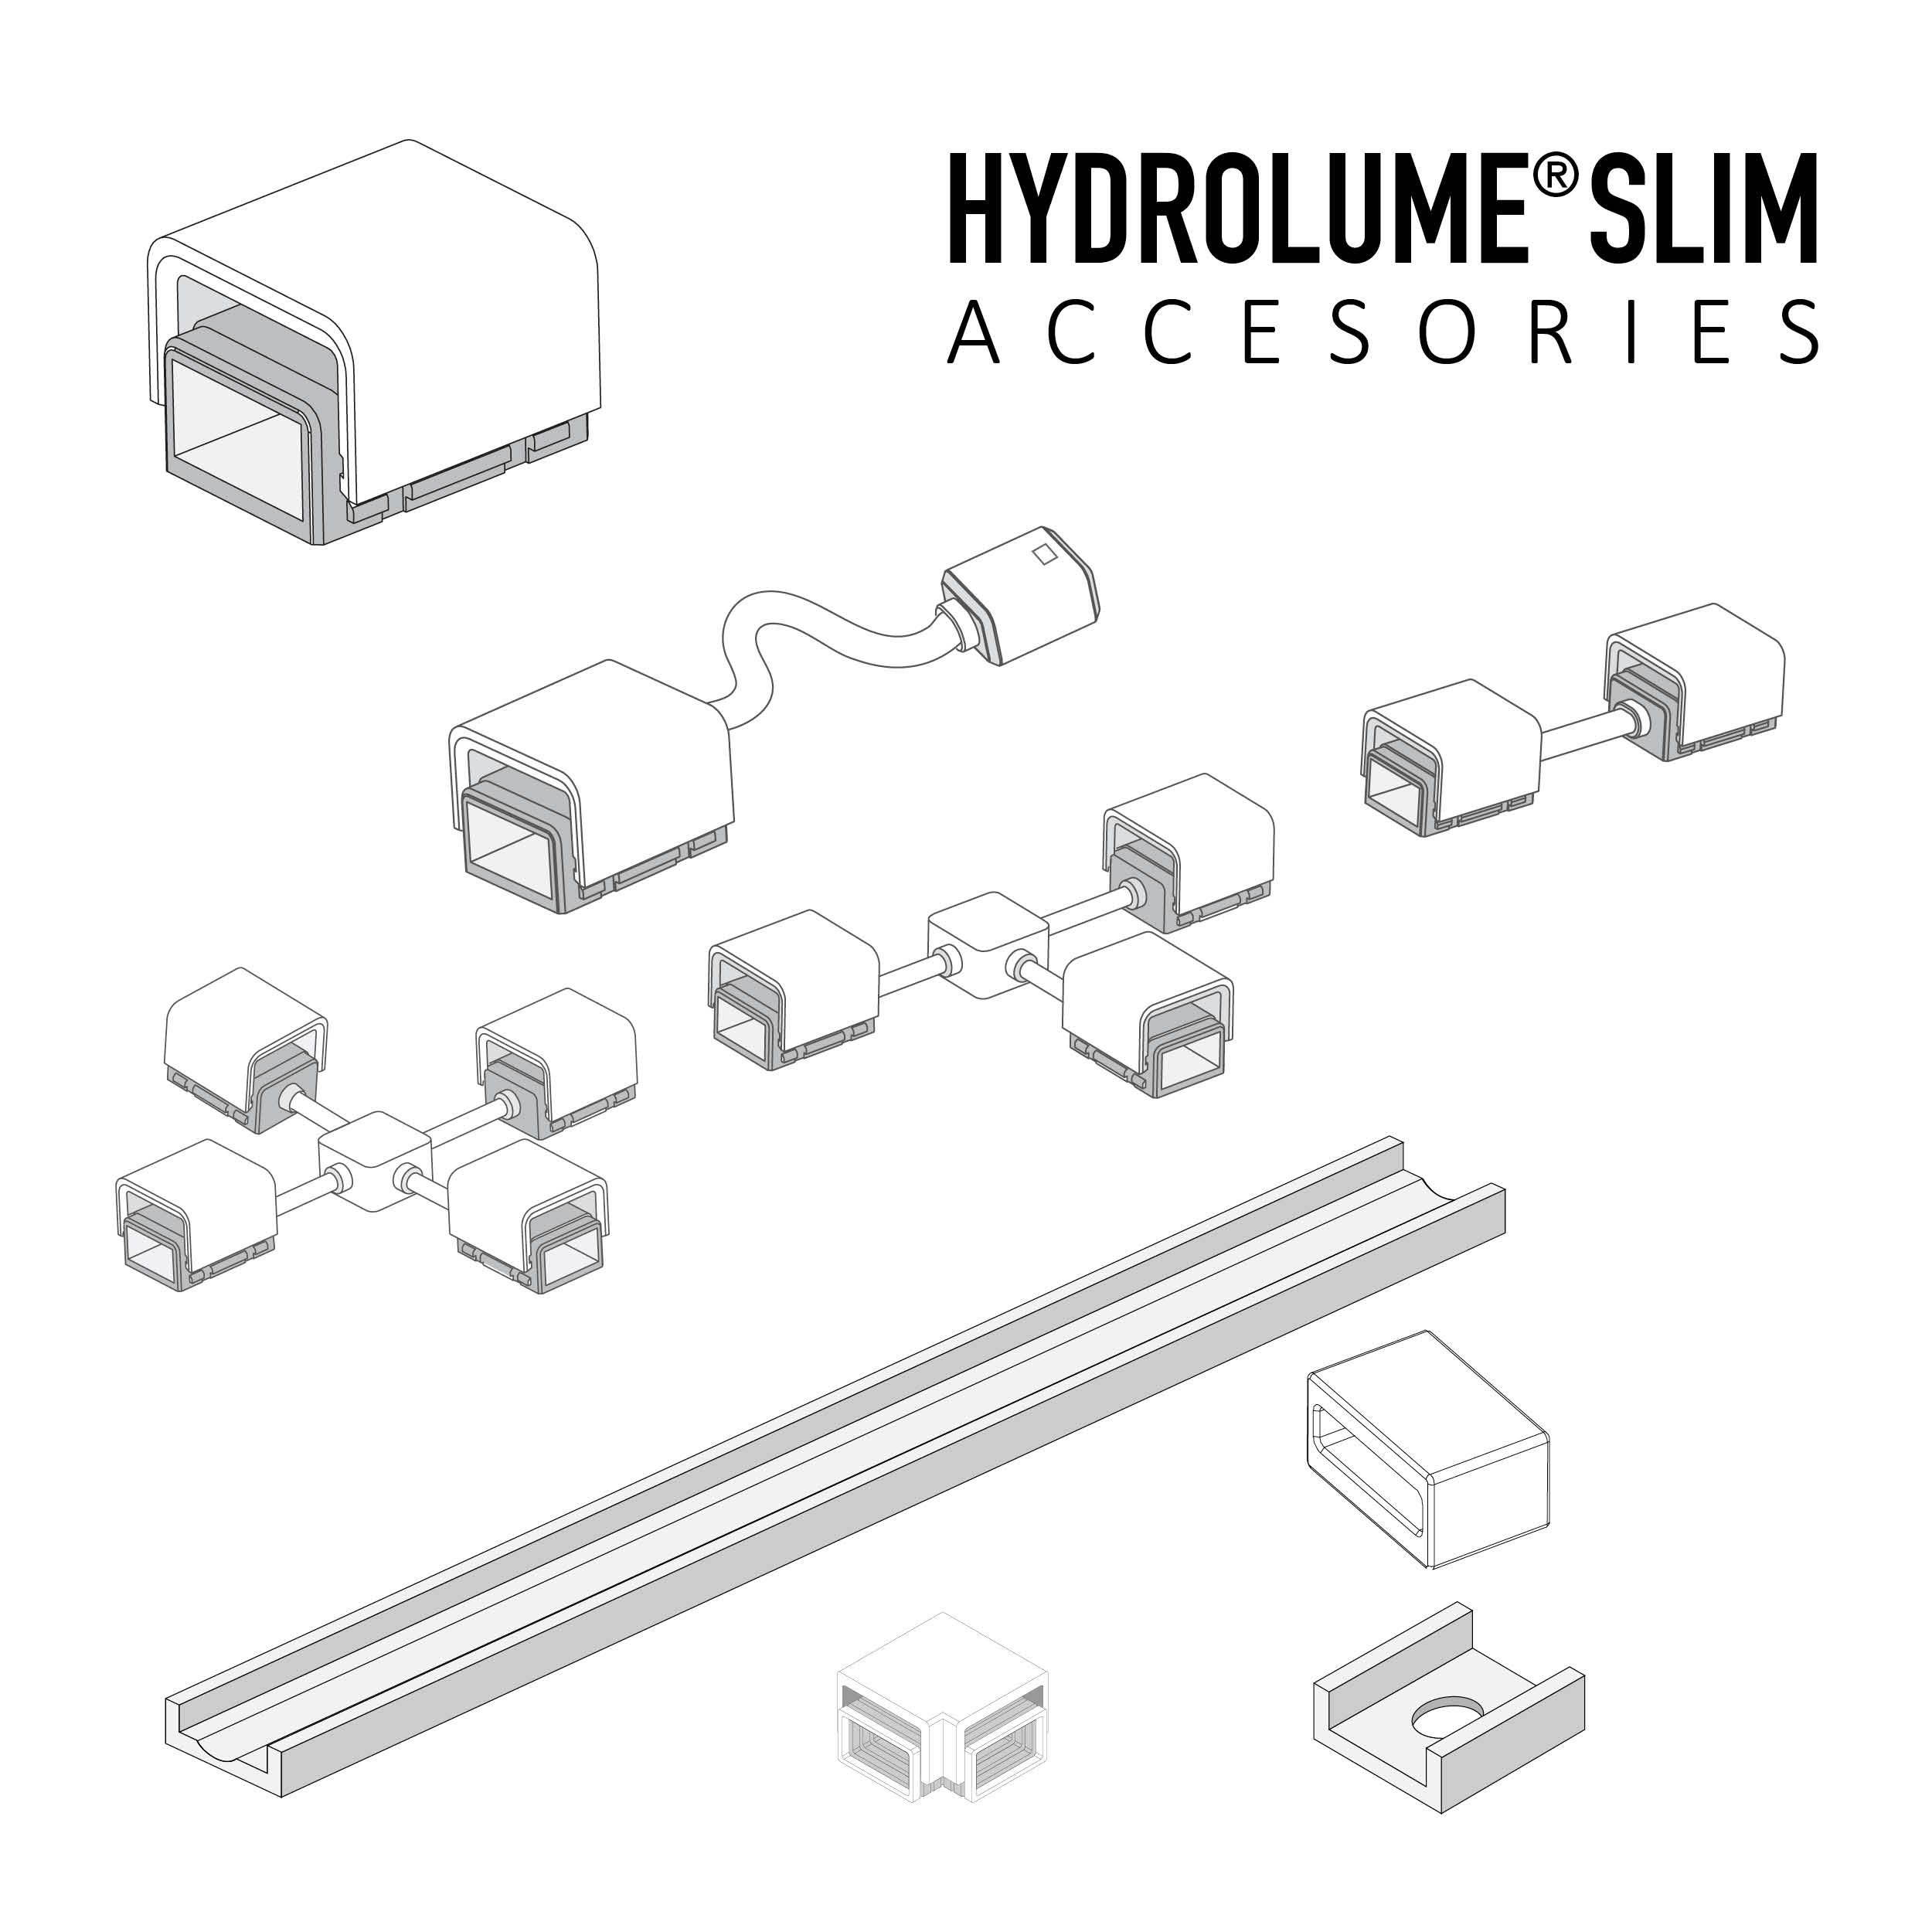 Hydrolume Slim Accessories